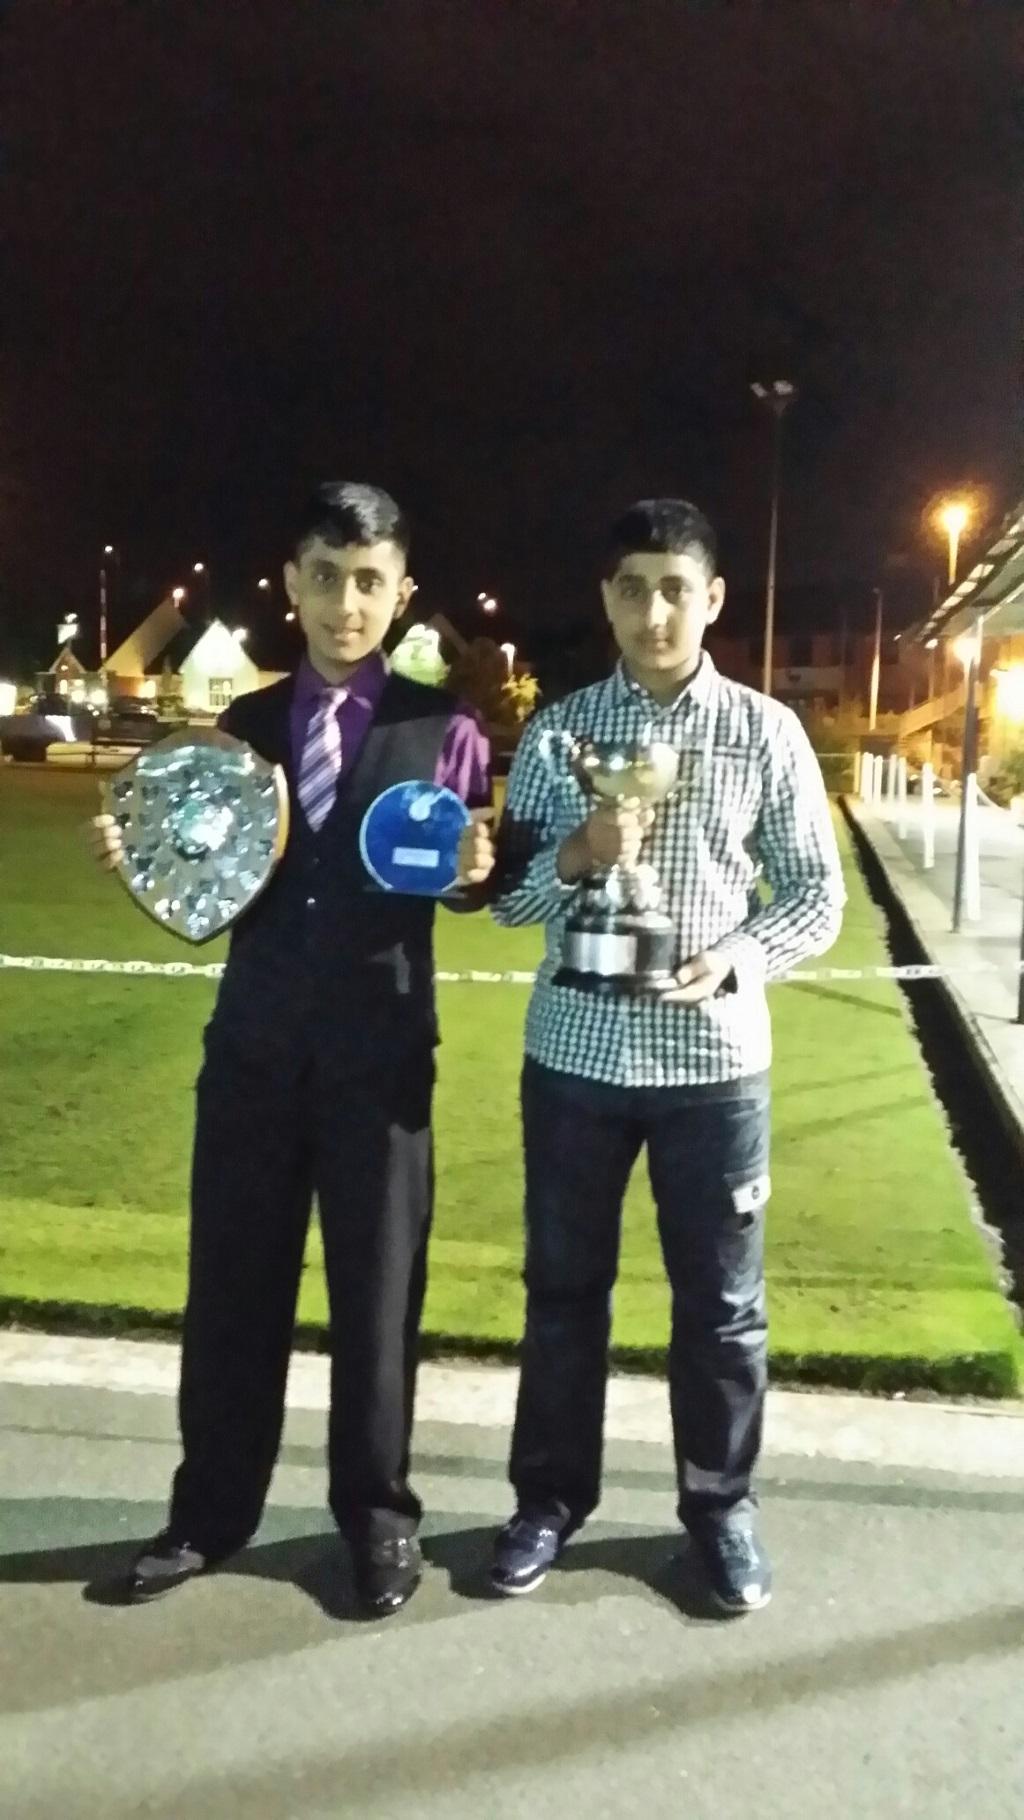 Asif Latif Winner Of U15 Bowling Award. Atif Latif With U17 League Cup.